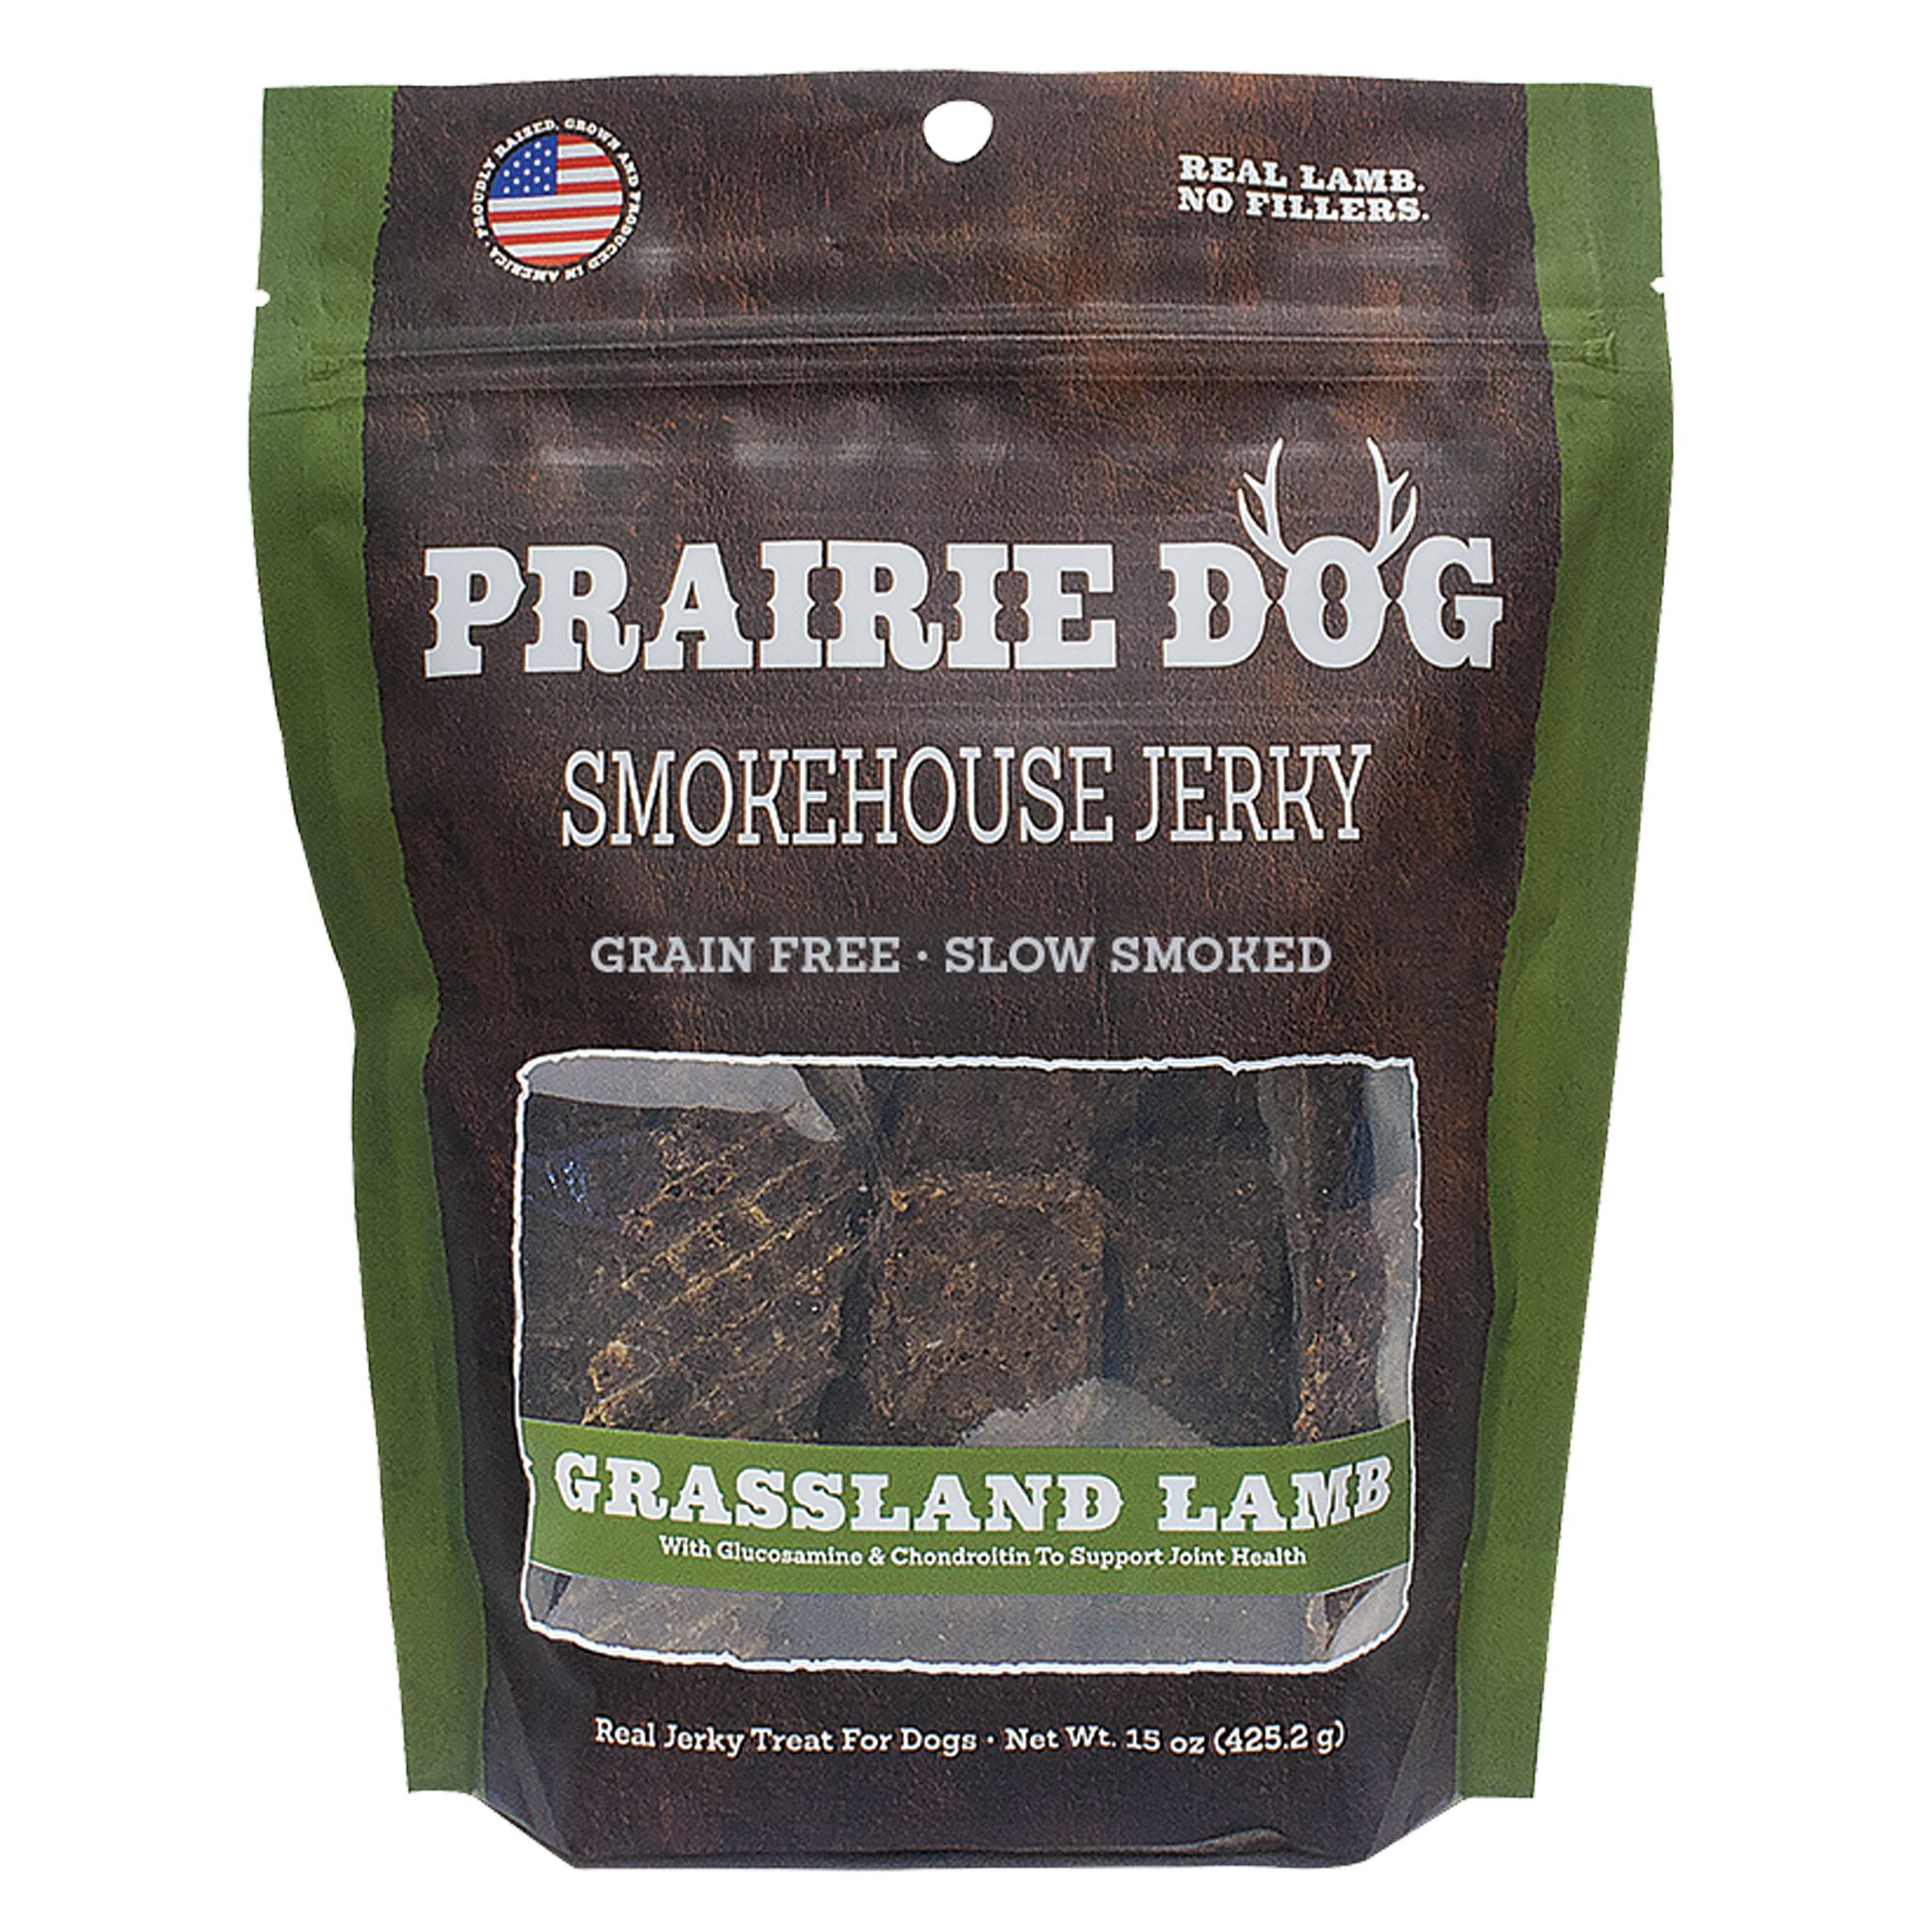 Prairie Dog Smokehouse Jerky Dog Treat Natural Grain Free Grassland Lamb Size 15 Oz